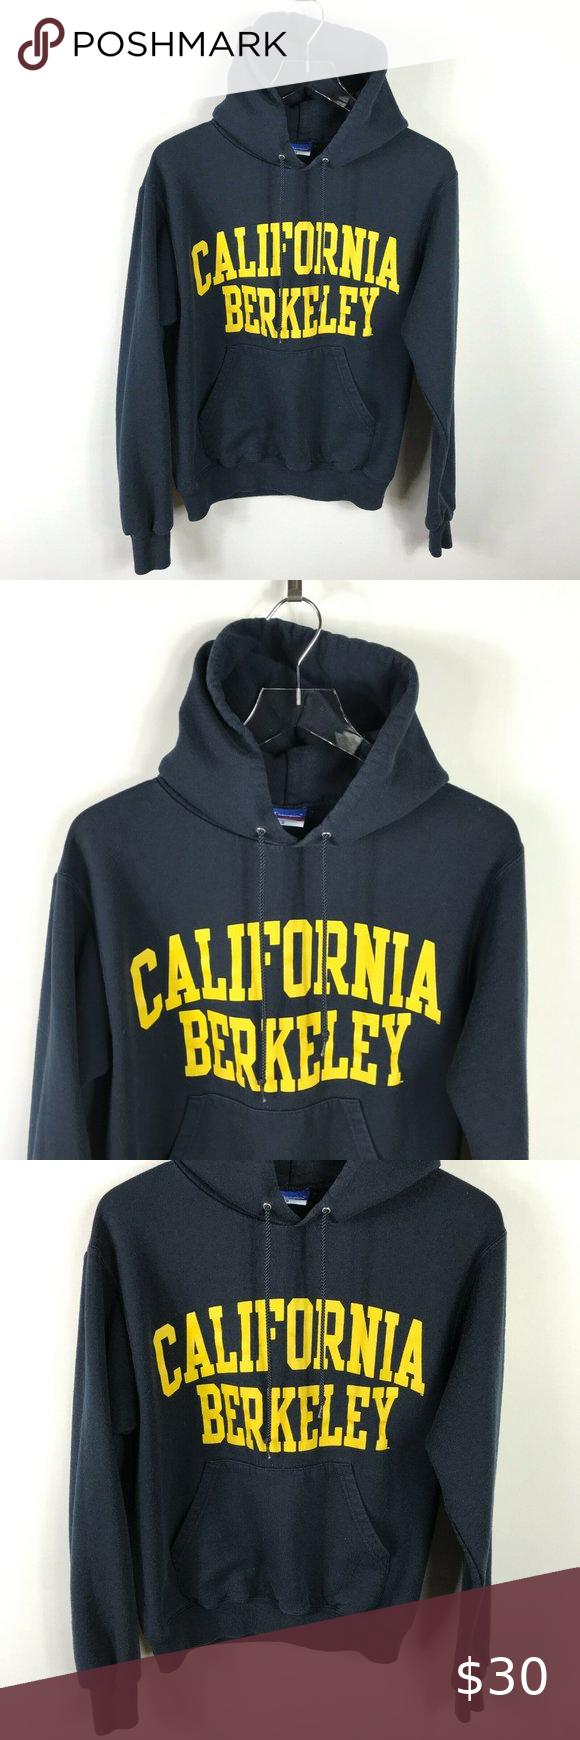 Champion Mens Hoodie Size S Blue Cal Berkeley Logo In 2021 Hoodies Men Champion Hooded Sweatshirt Mens Sweatshirts [ 1740 x 580 Pixel ]